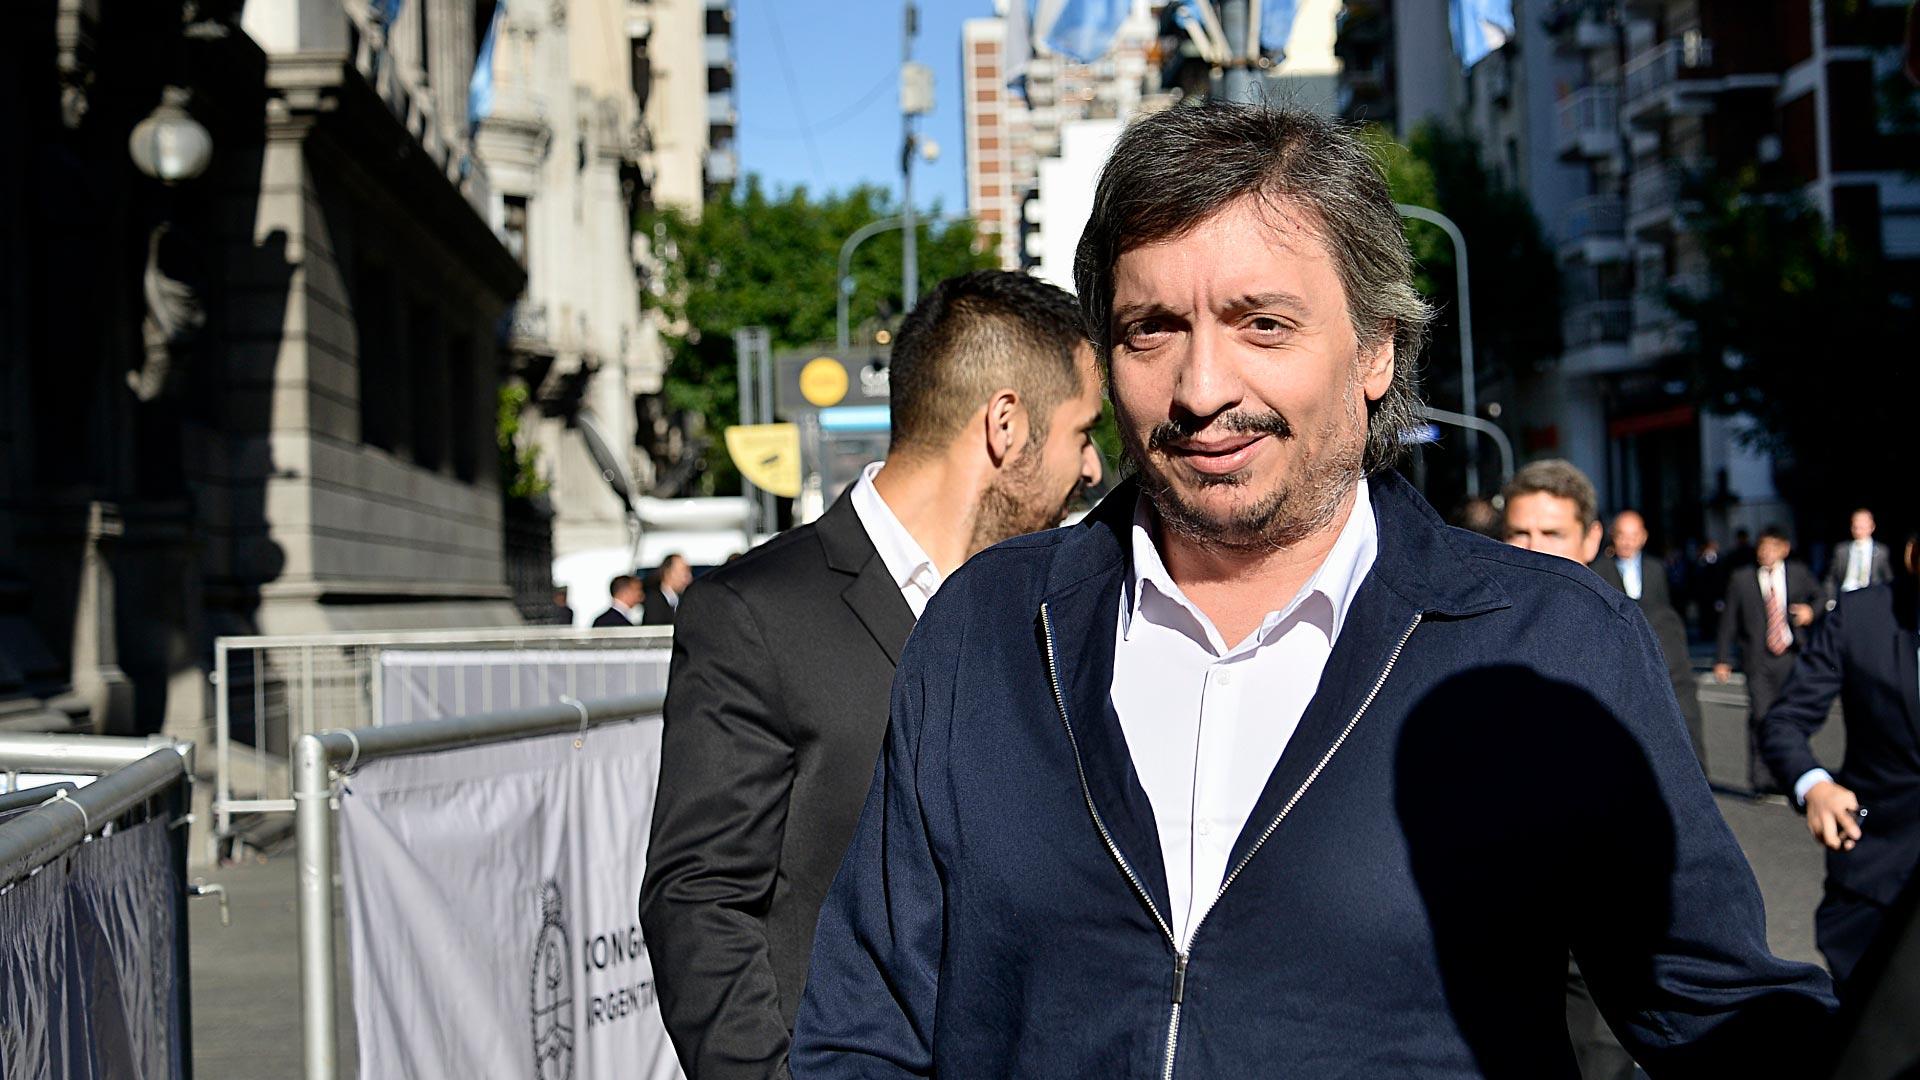 Máximo Kirchner, jefe del bloque de diputados del Frente de Todos